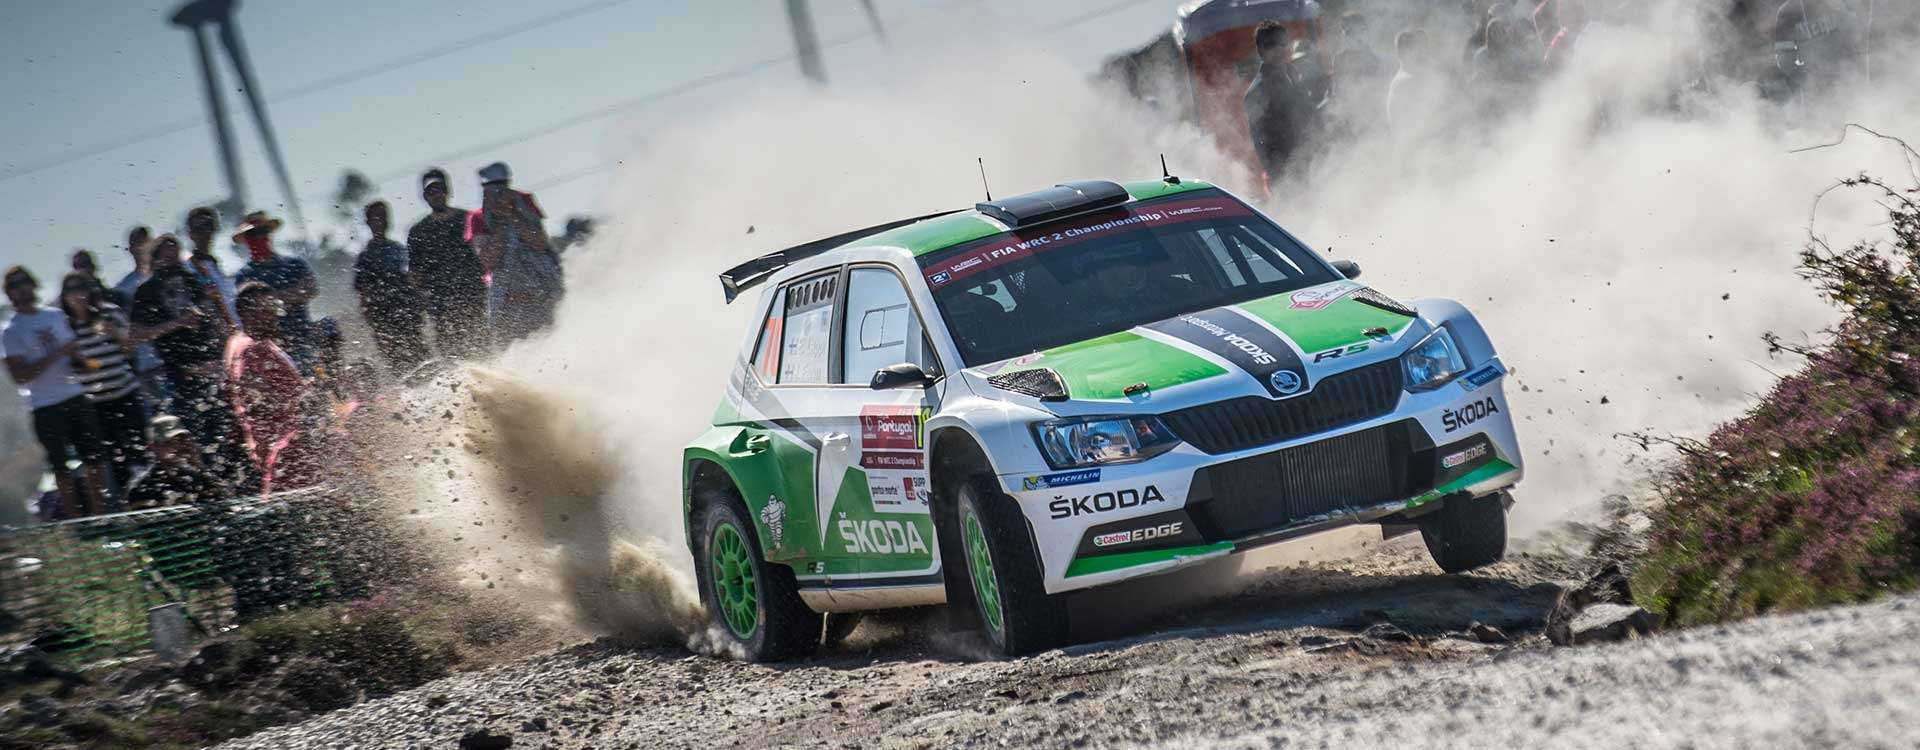 Two podium positions: ŠKODA celebrates brilliant WRC debut with the Fabia R5